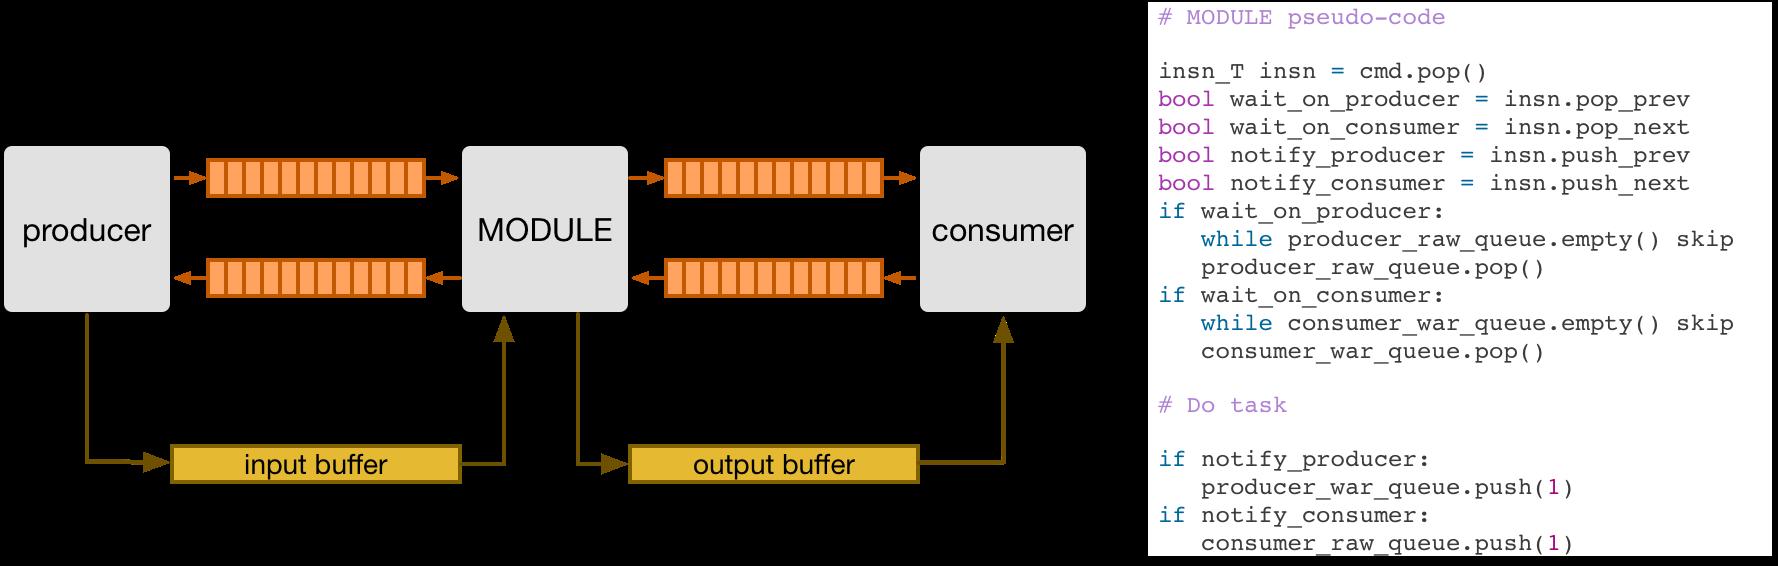 https://raw.githubusercontent.com/uwsaml/web-data/master/vta/developer/dataflow.png